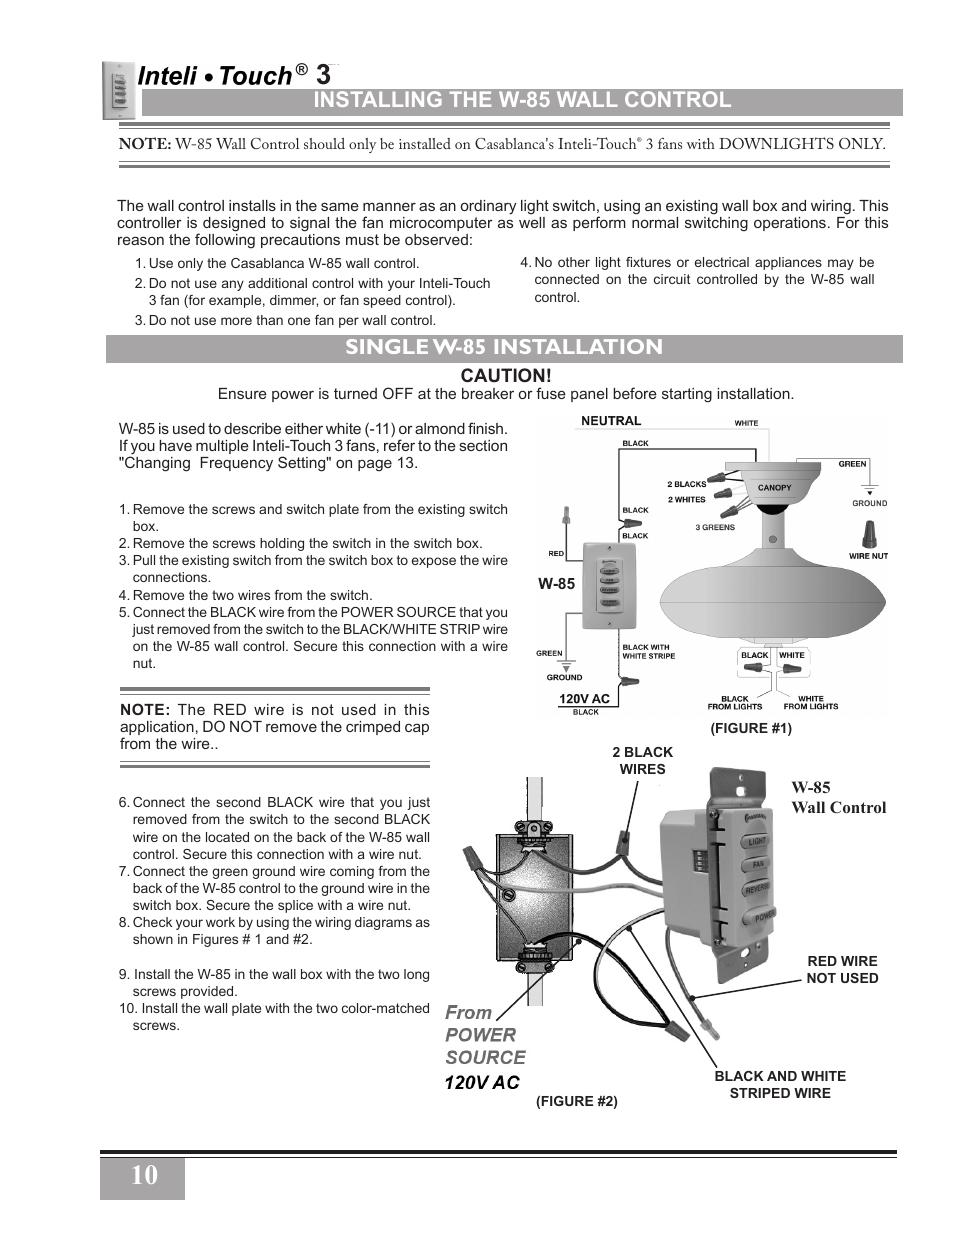 medium resolution of installing the w 85 wall control single w 85 installation casablanca fan company inteli touch 3 pn user manual page 10 17